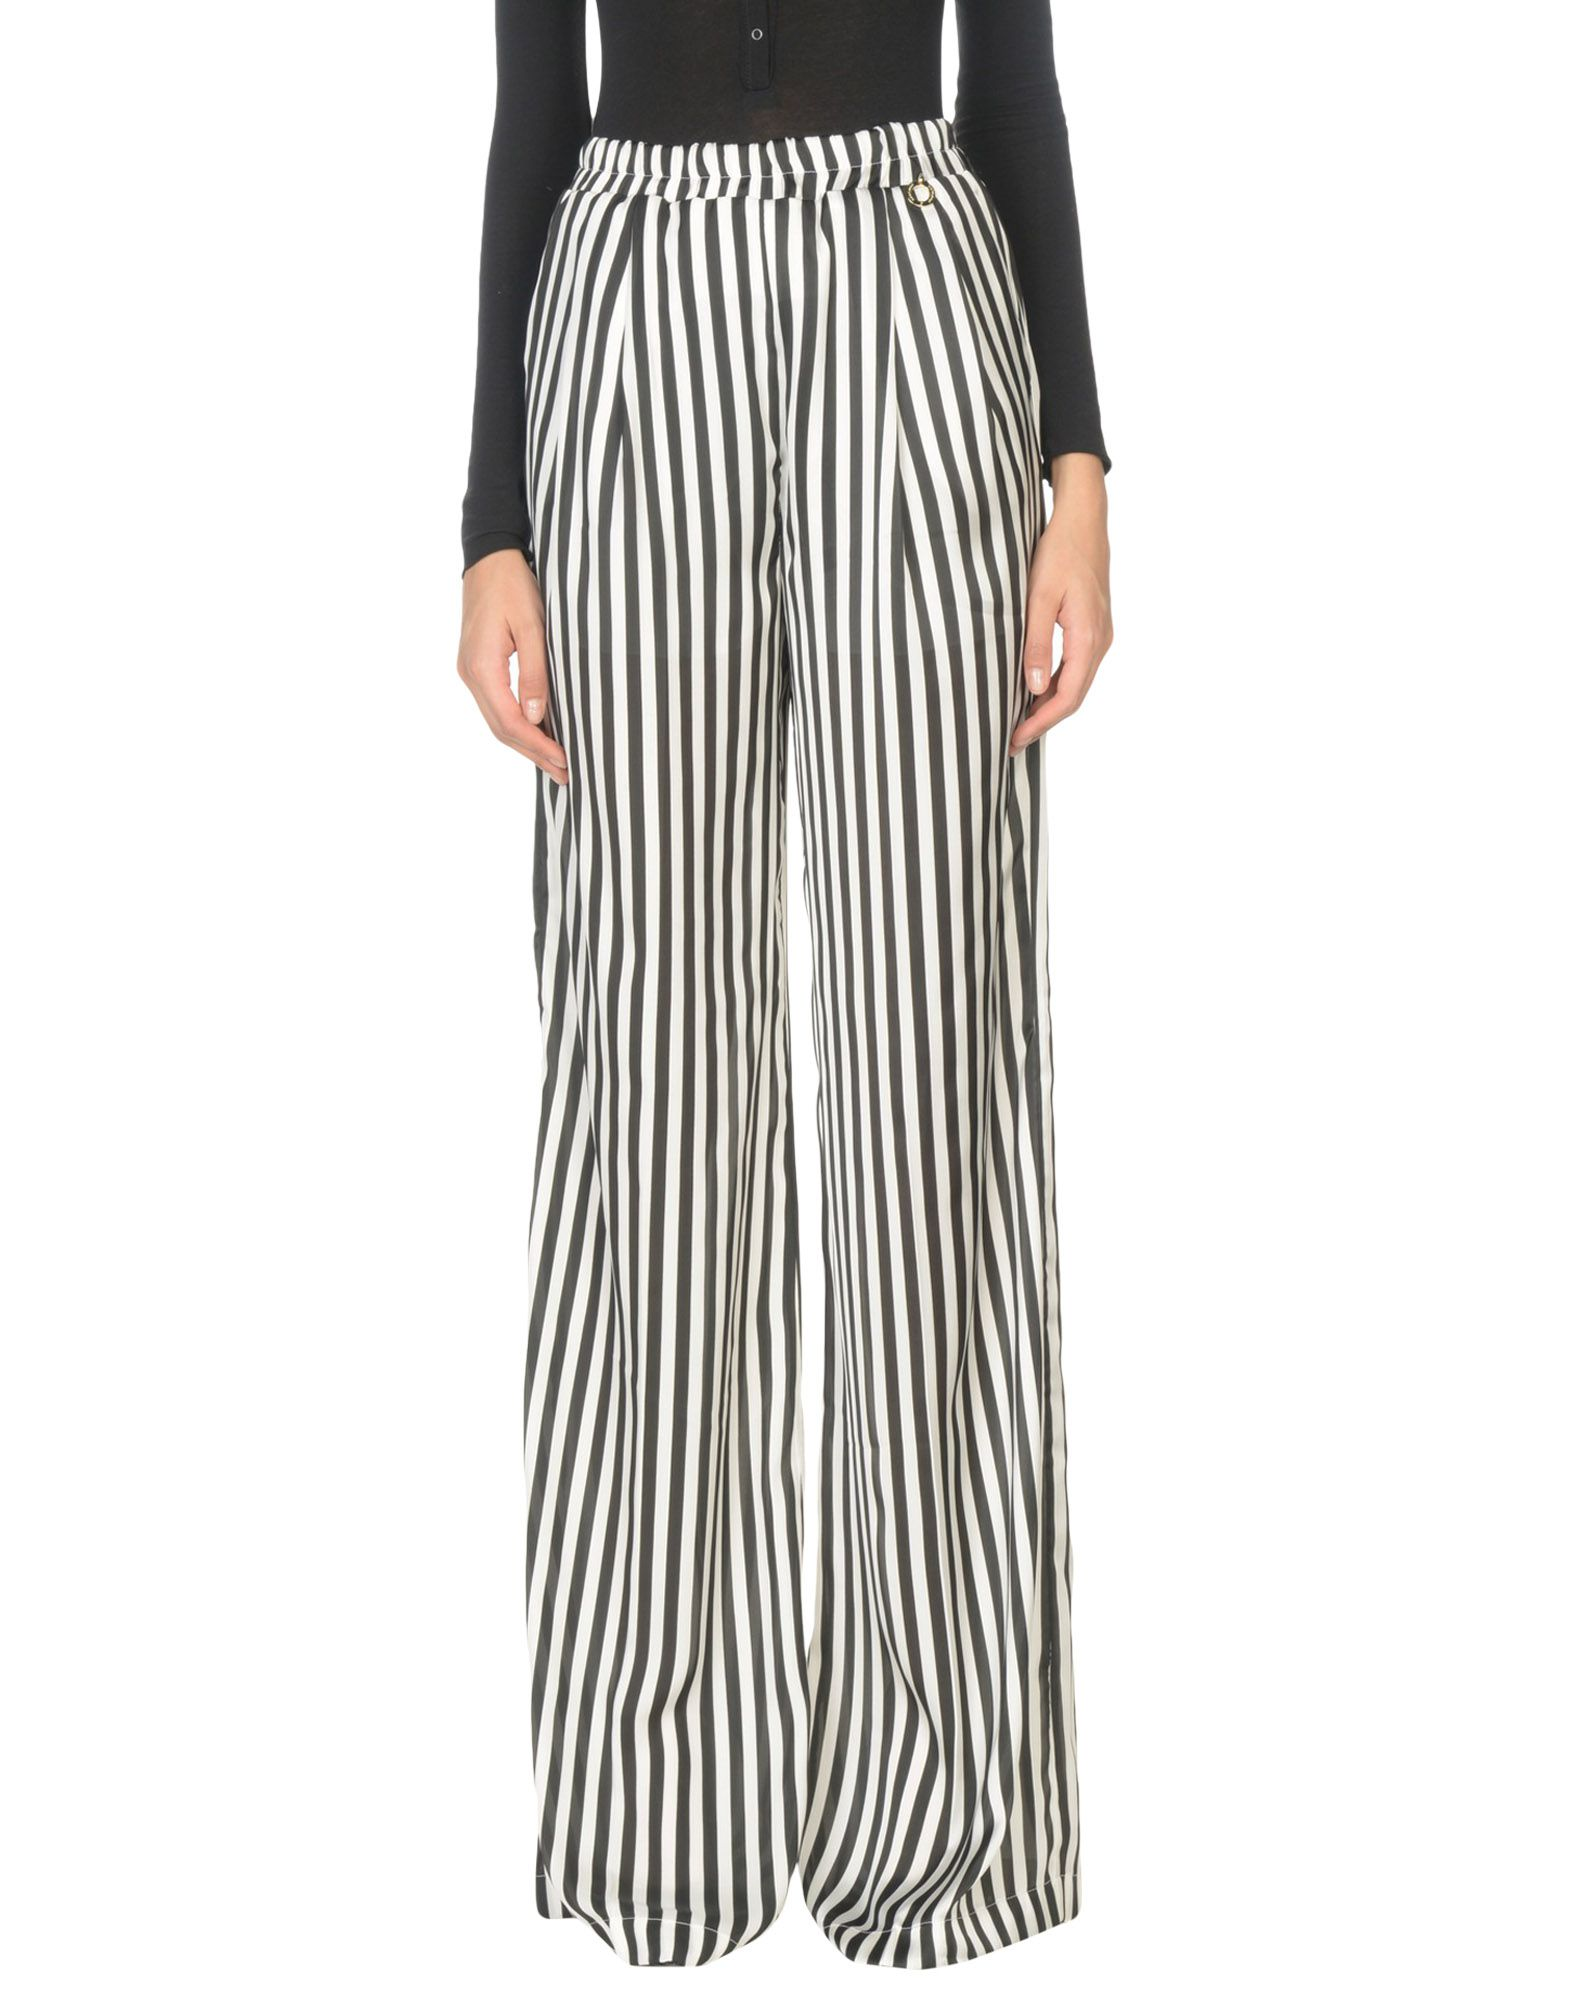 Pantalone Mangano Donna - Acquista online su Dwgzd0c